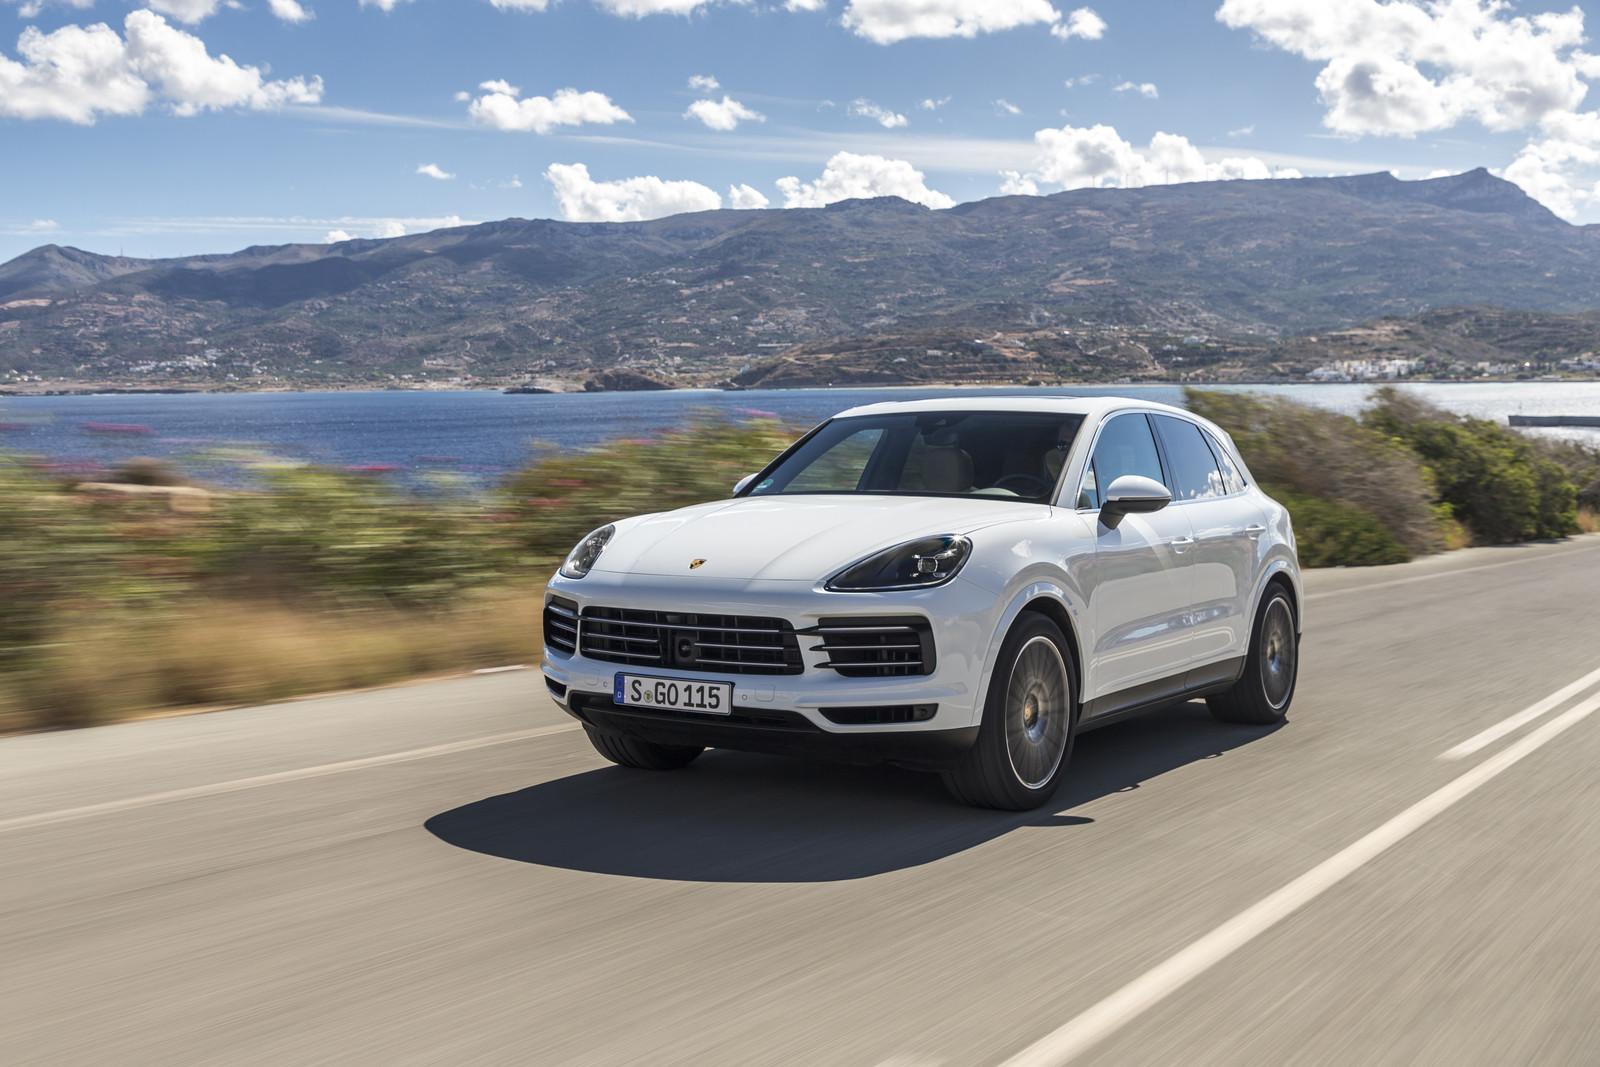 Foto de Porsche Cayenne 2018 (34/39)